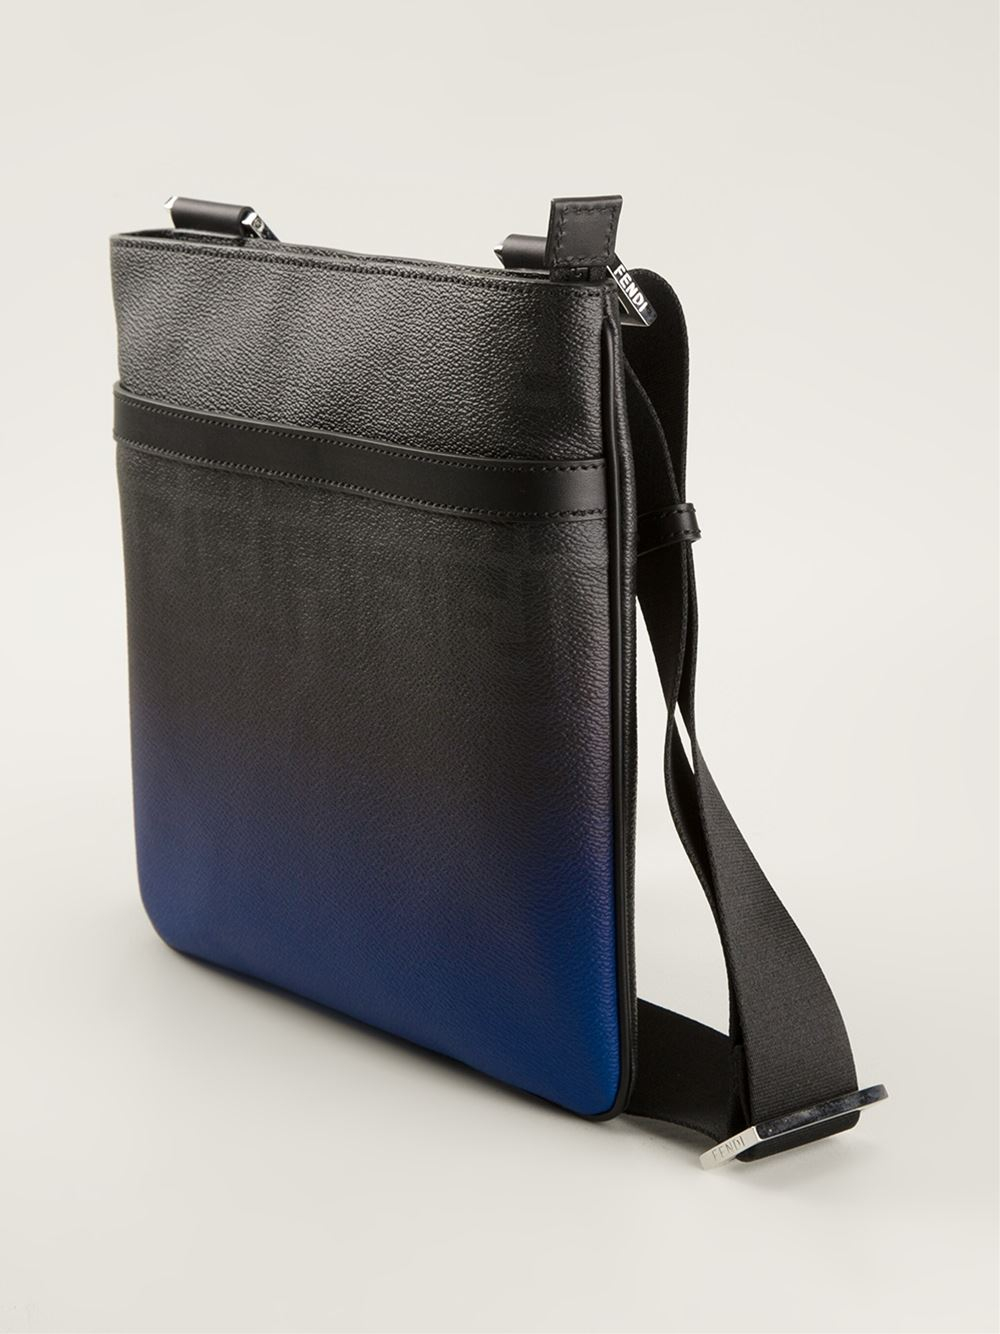 c19677b409b6 ... best lyst fendi flat messenger bag in blue for men 5ac83 2eb0e